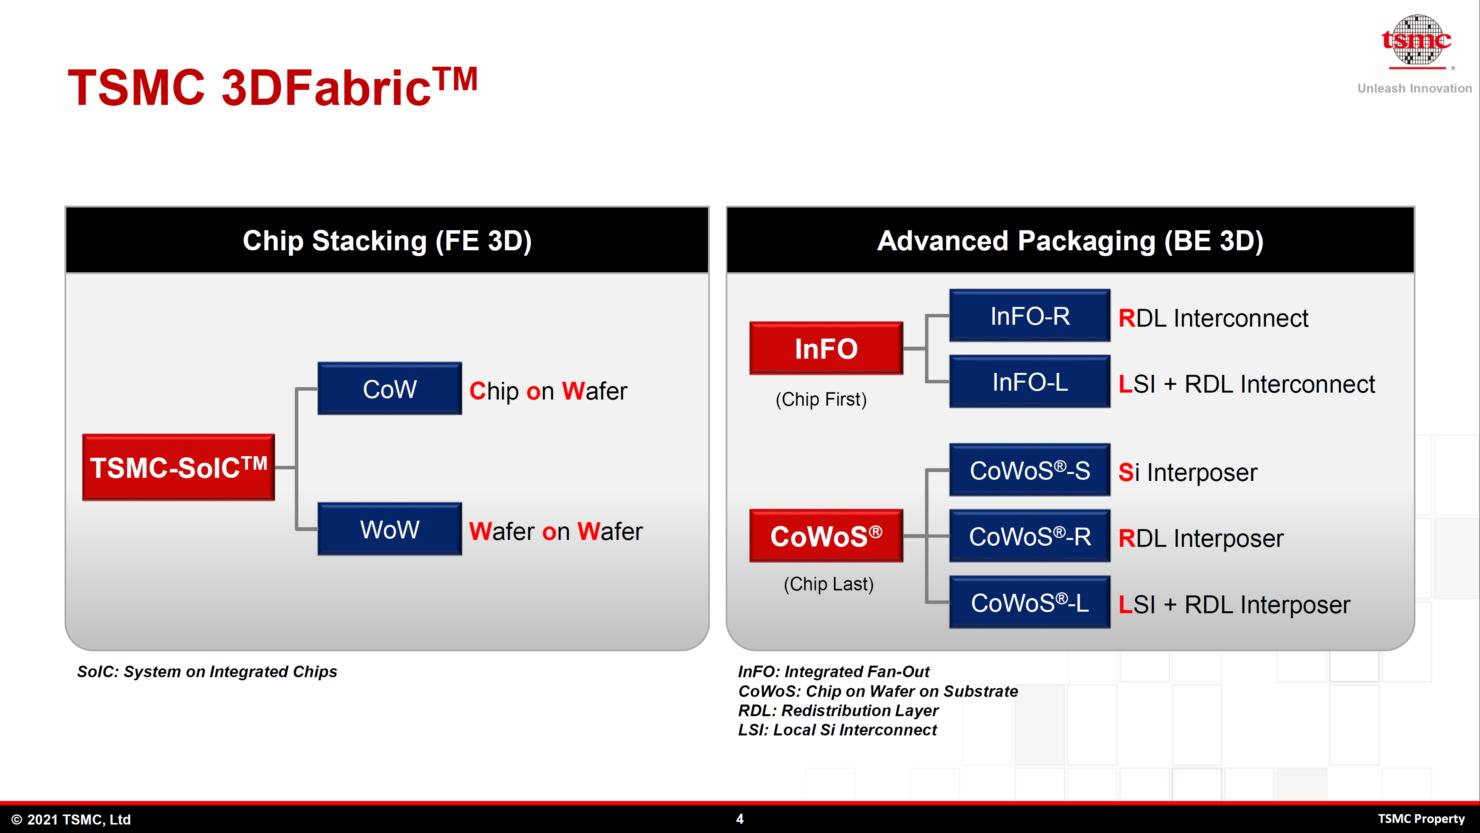 tsmc-advanced-packaging-technologies-cowos-_2